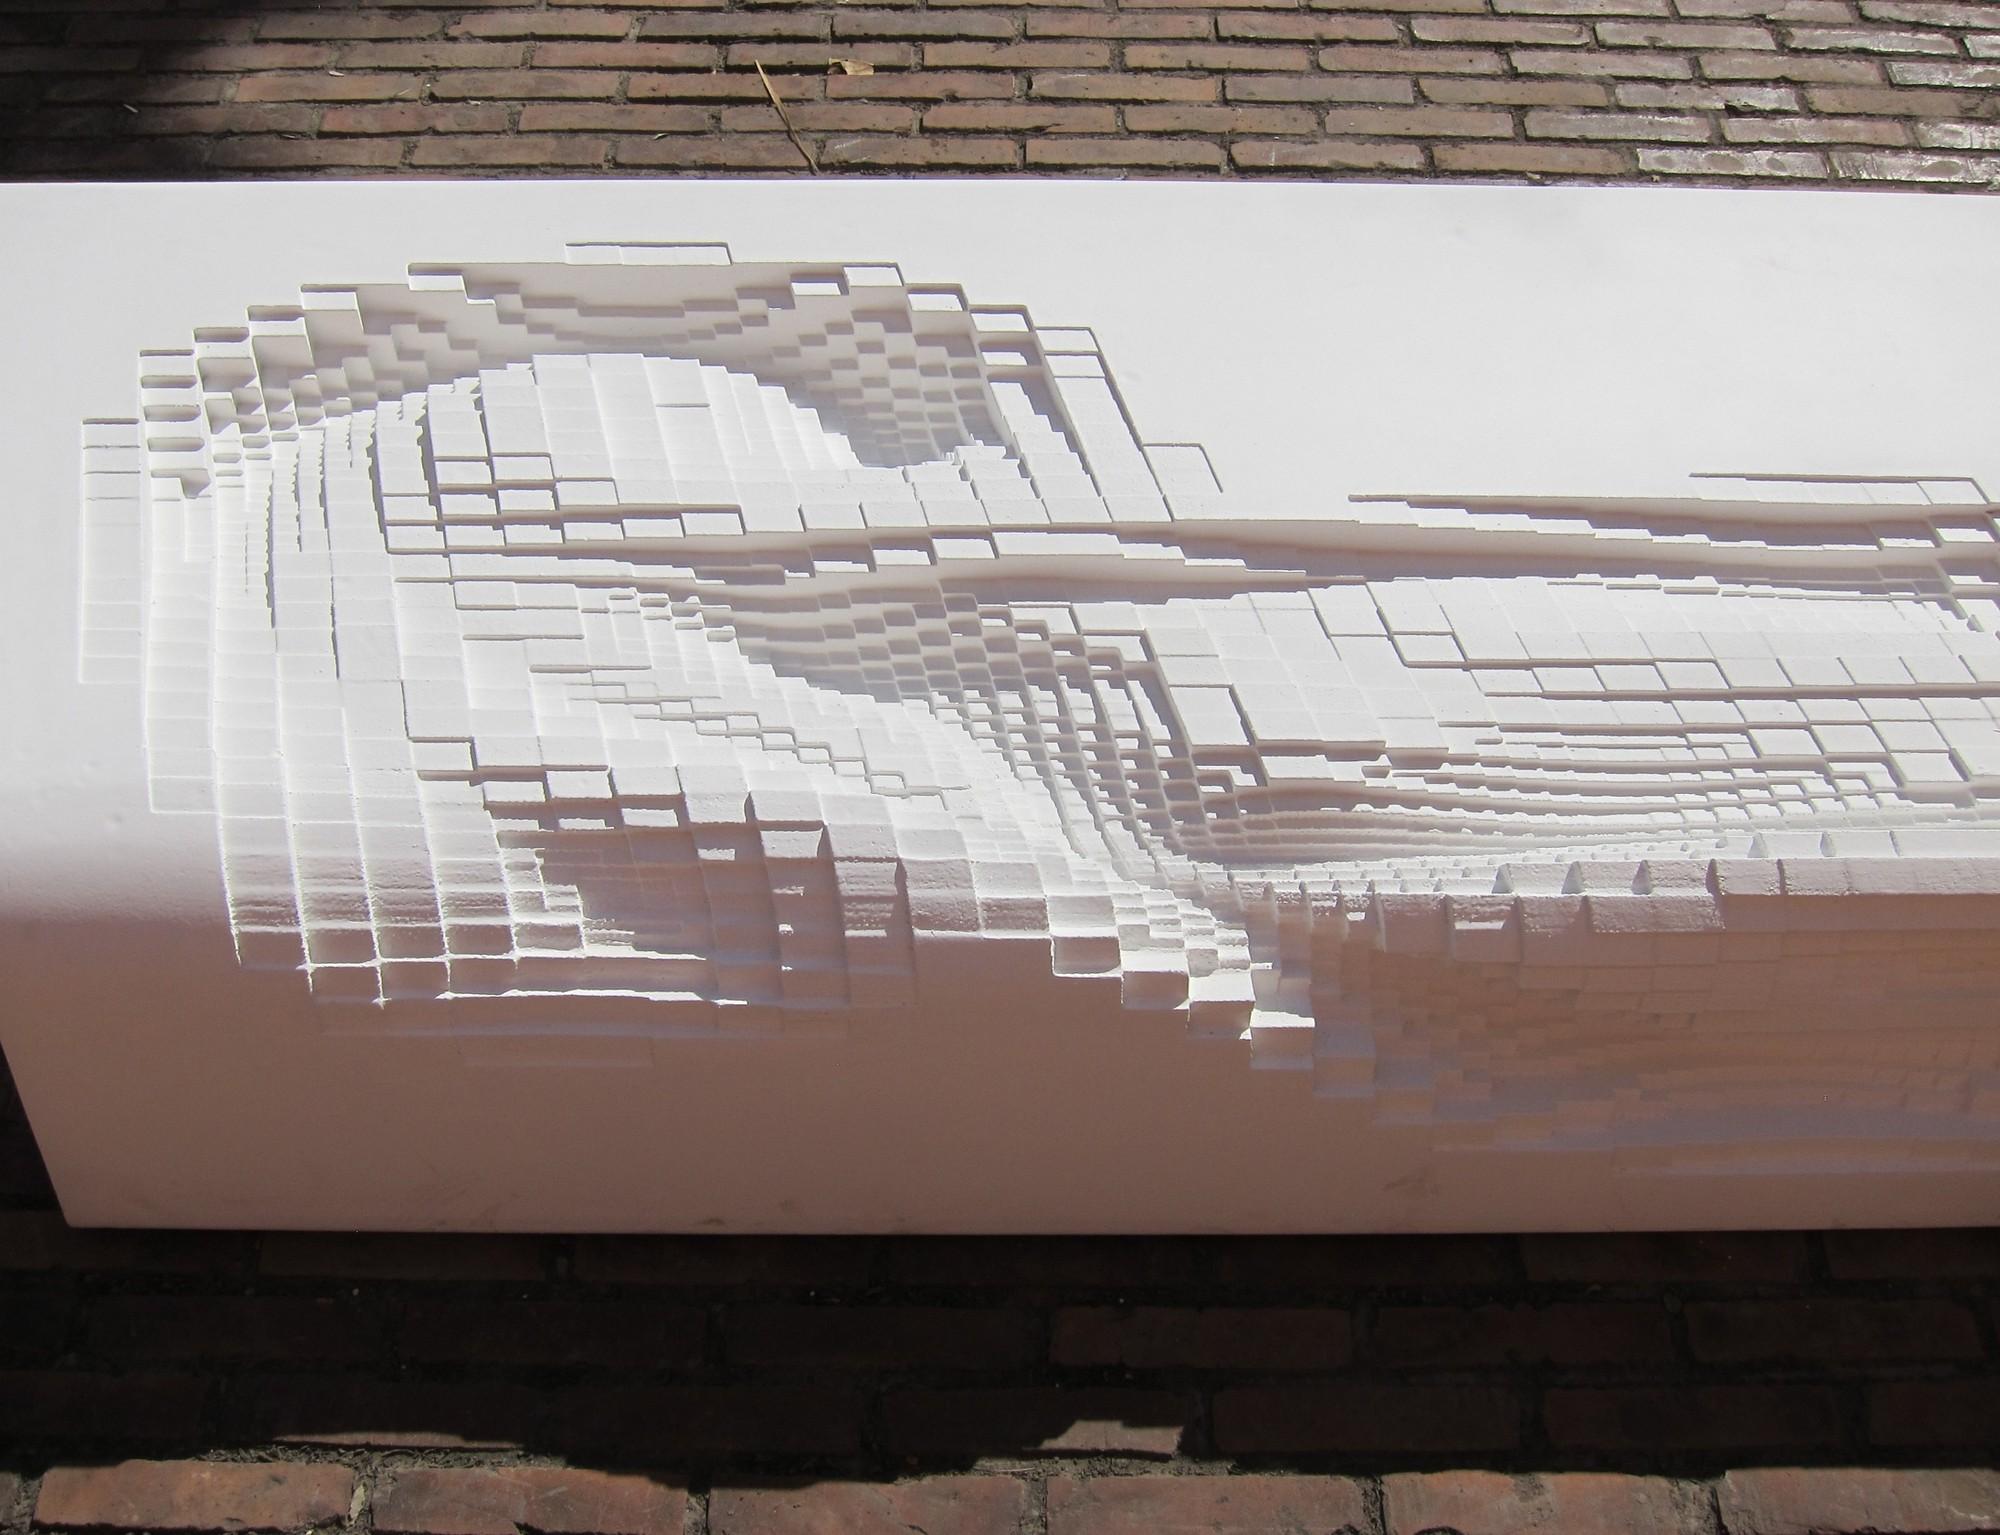 Tsunami / Wax Architects, Cortesia de Wax Architects